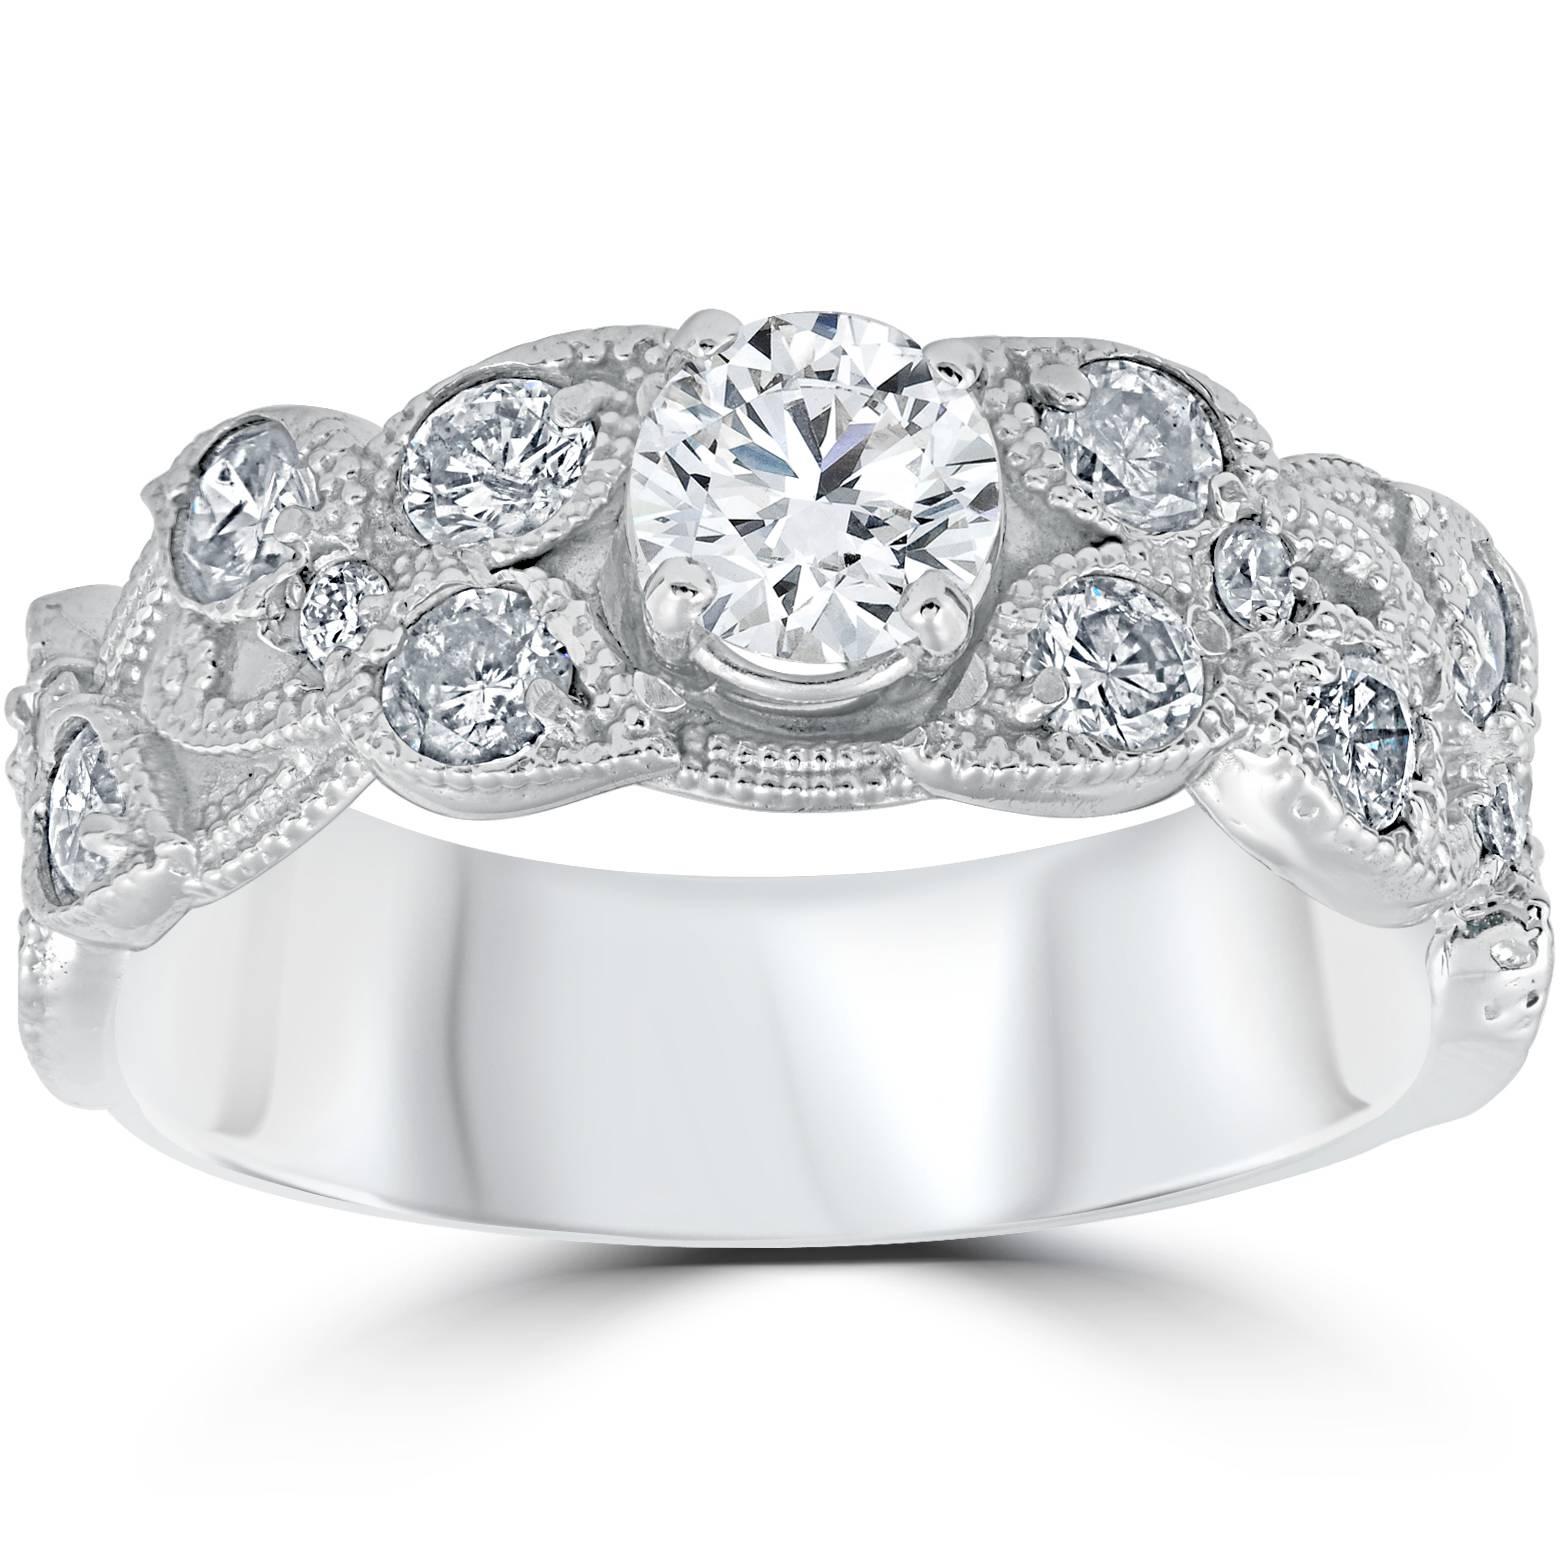 2ct vintage filigree engagement ring 14k white gold